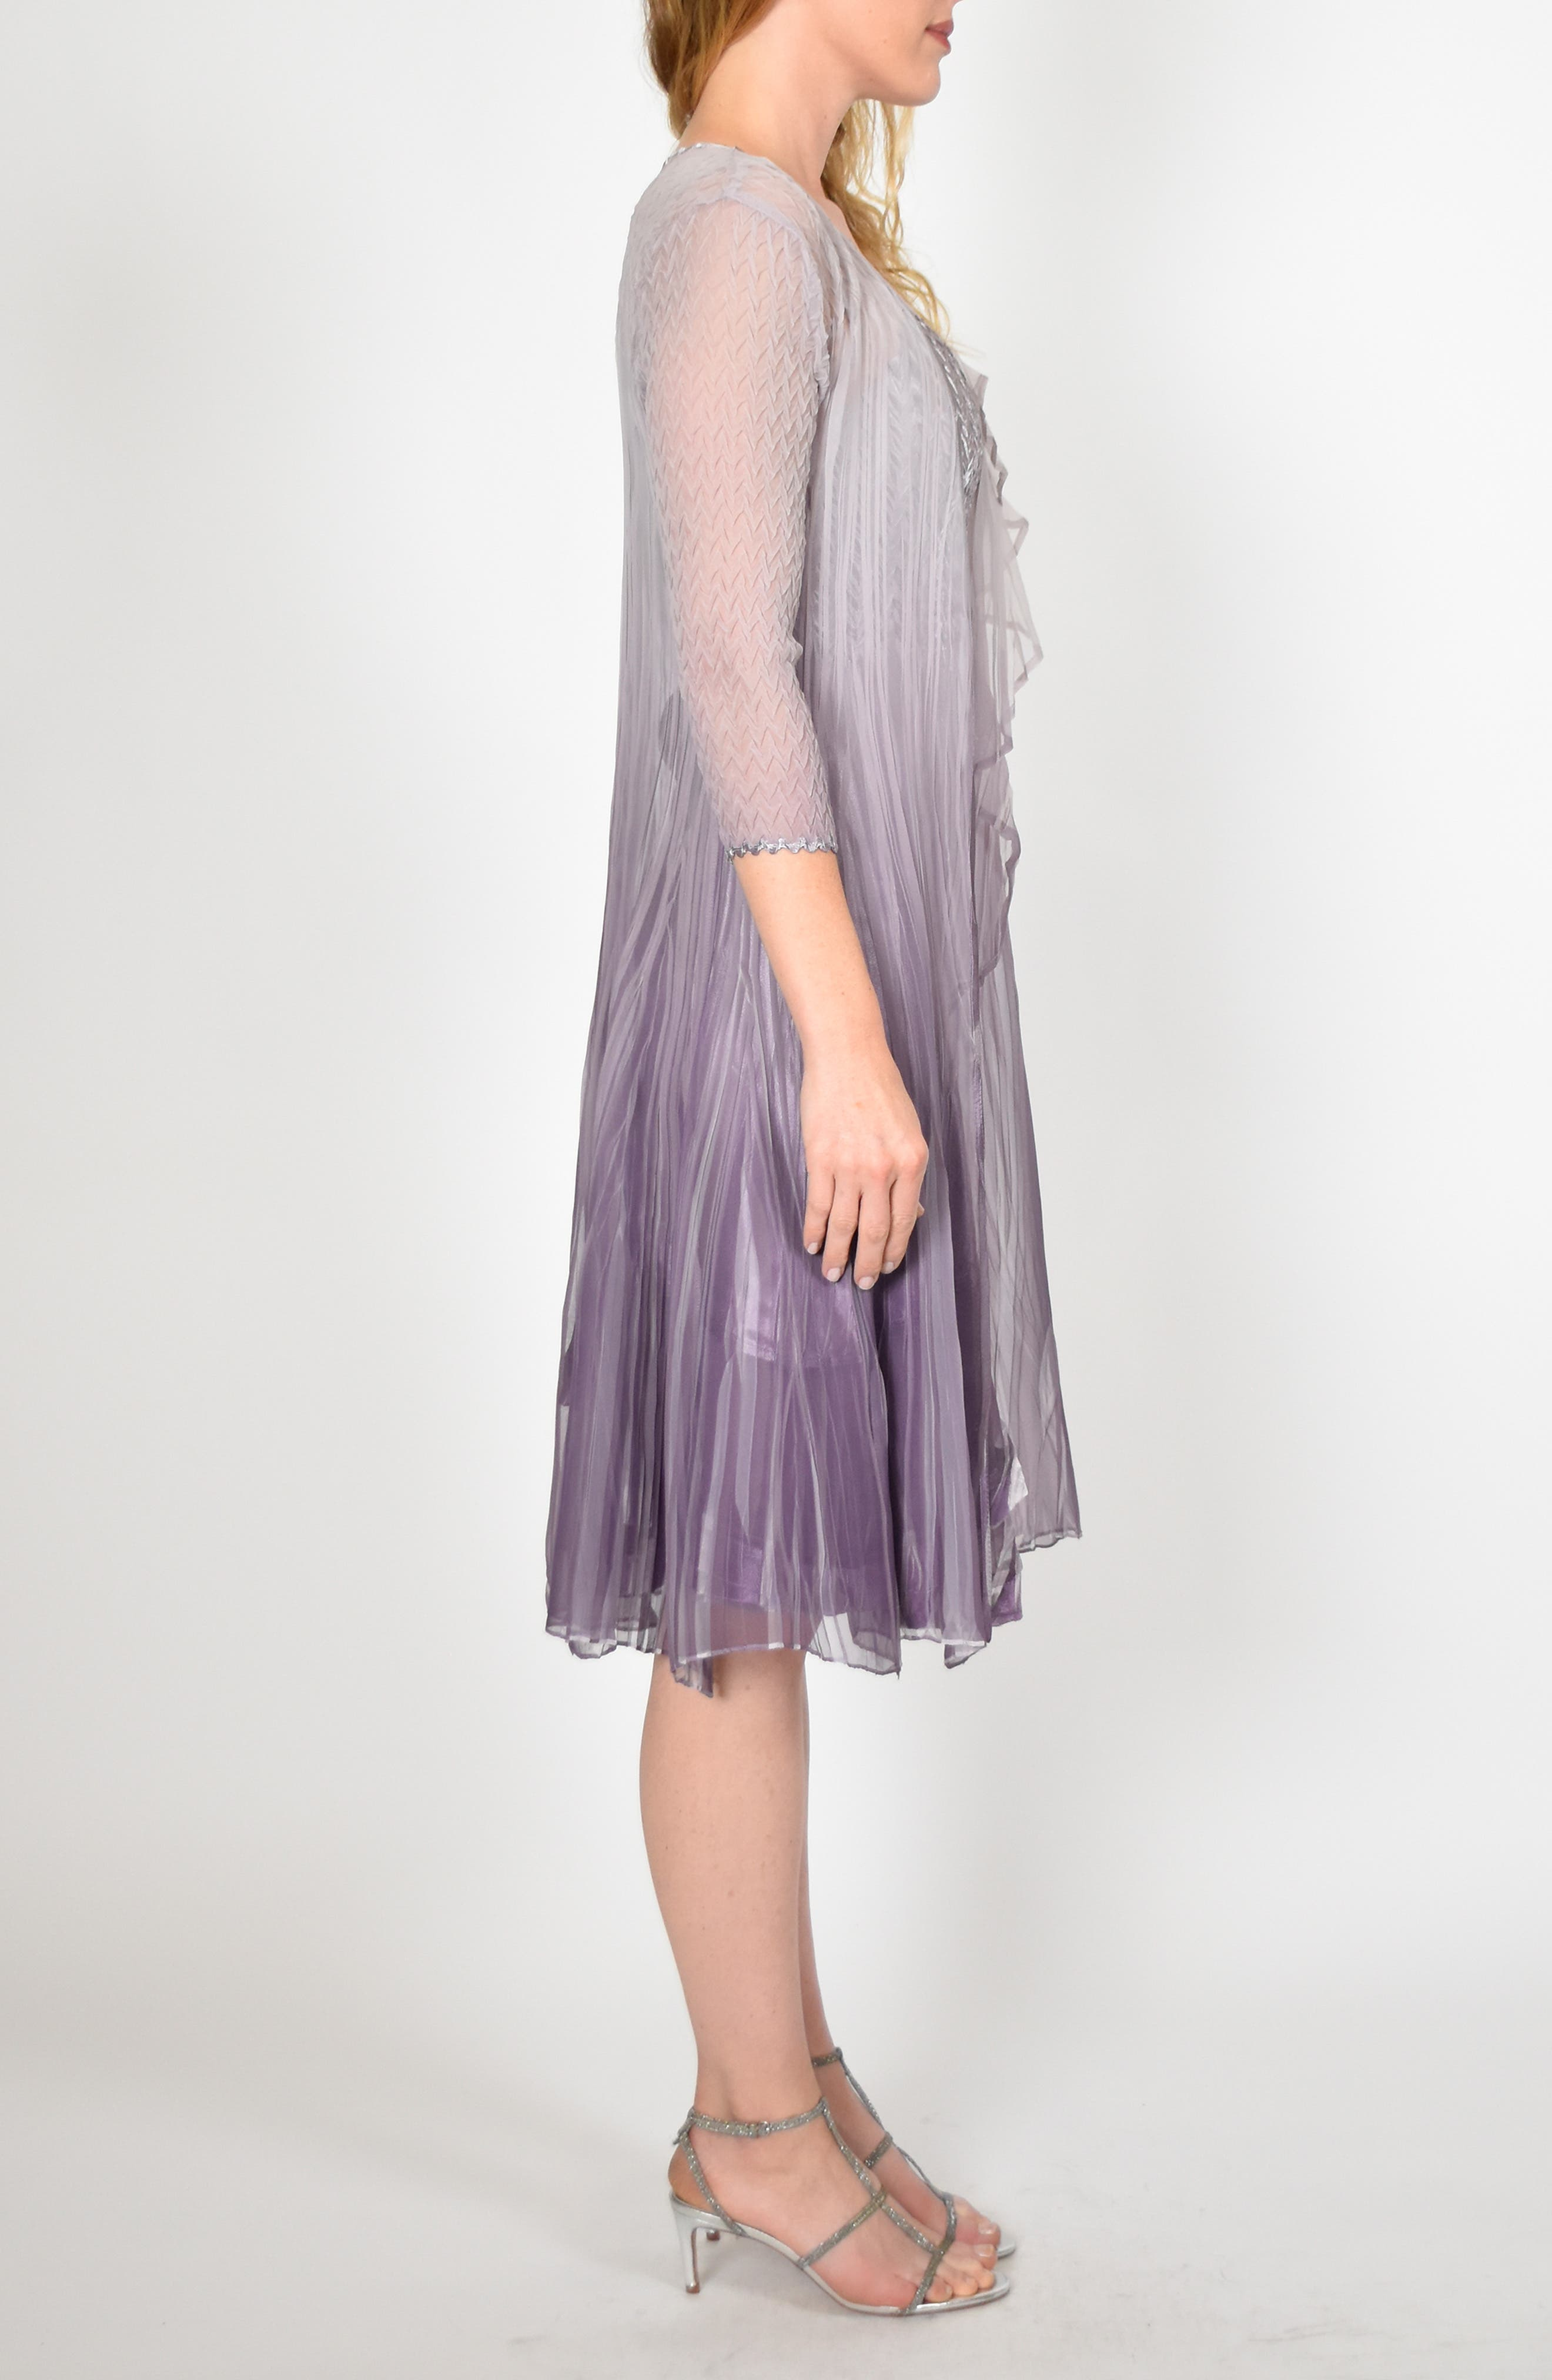 KOMAROV, Komorav Charmeuse Dress with Cascade Jacket, Alternate thumbnail 7, color, GREY VIOLET ORCHID OMBRE